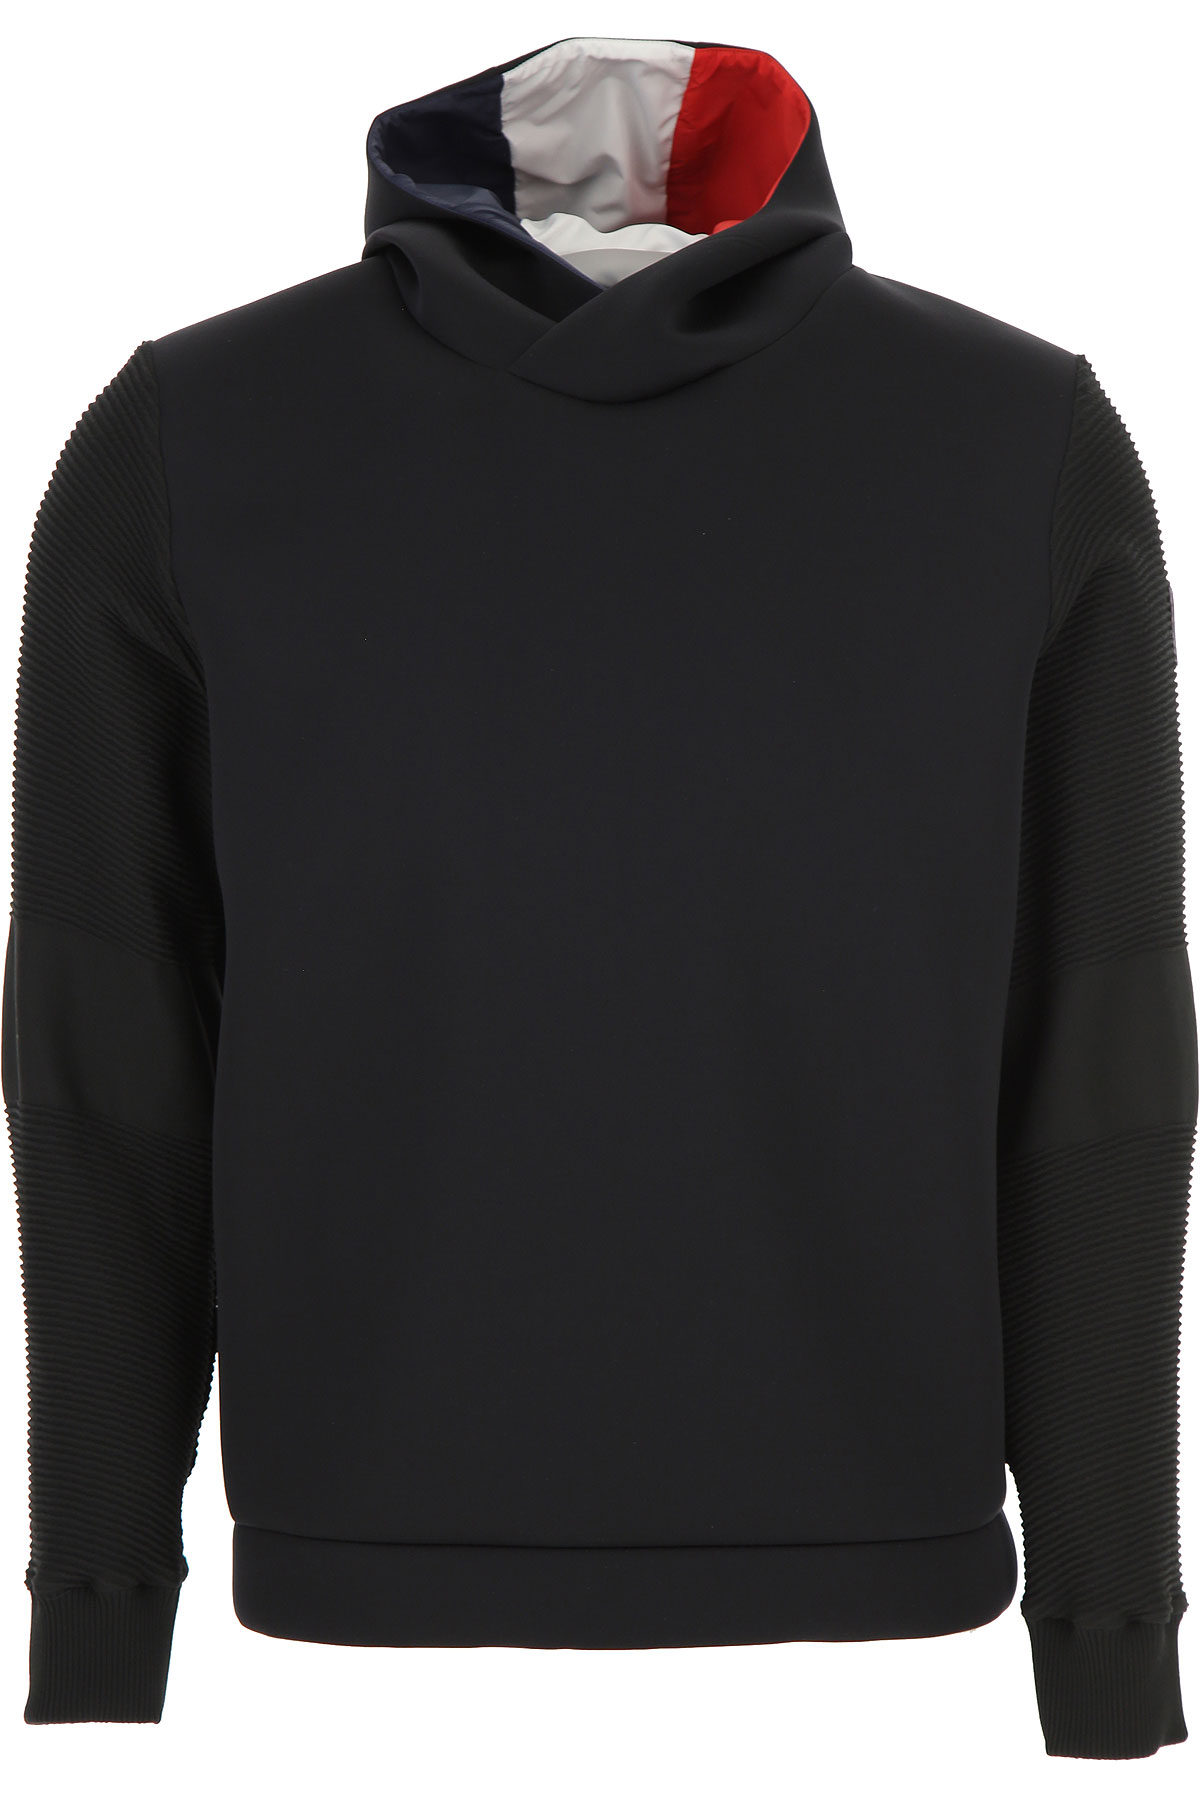 Rossignol Sweatshirt for Men On Sale, Black, polyester, 2019, L M XL